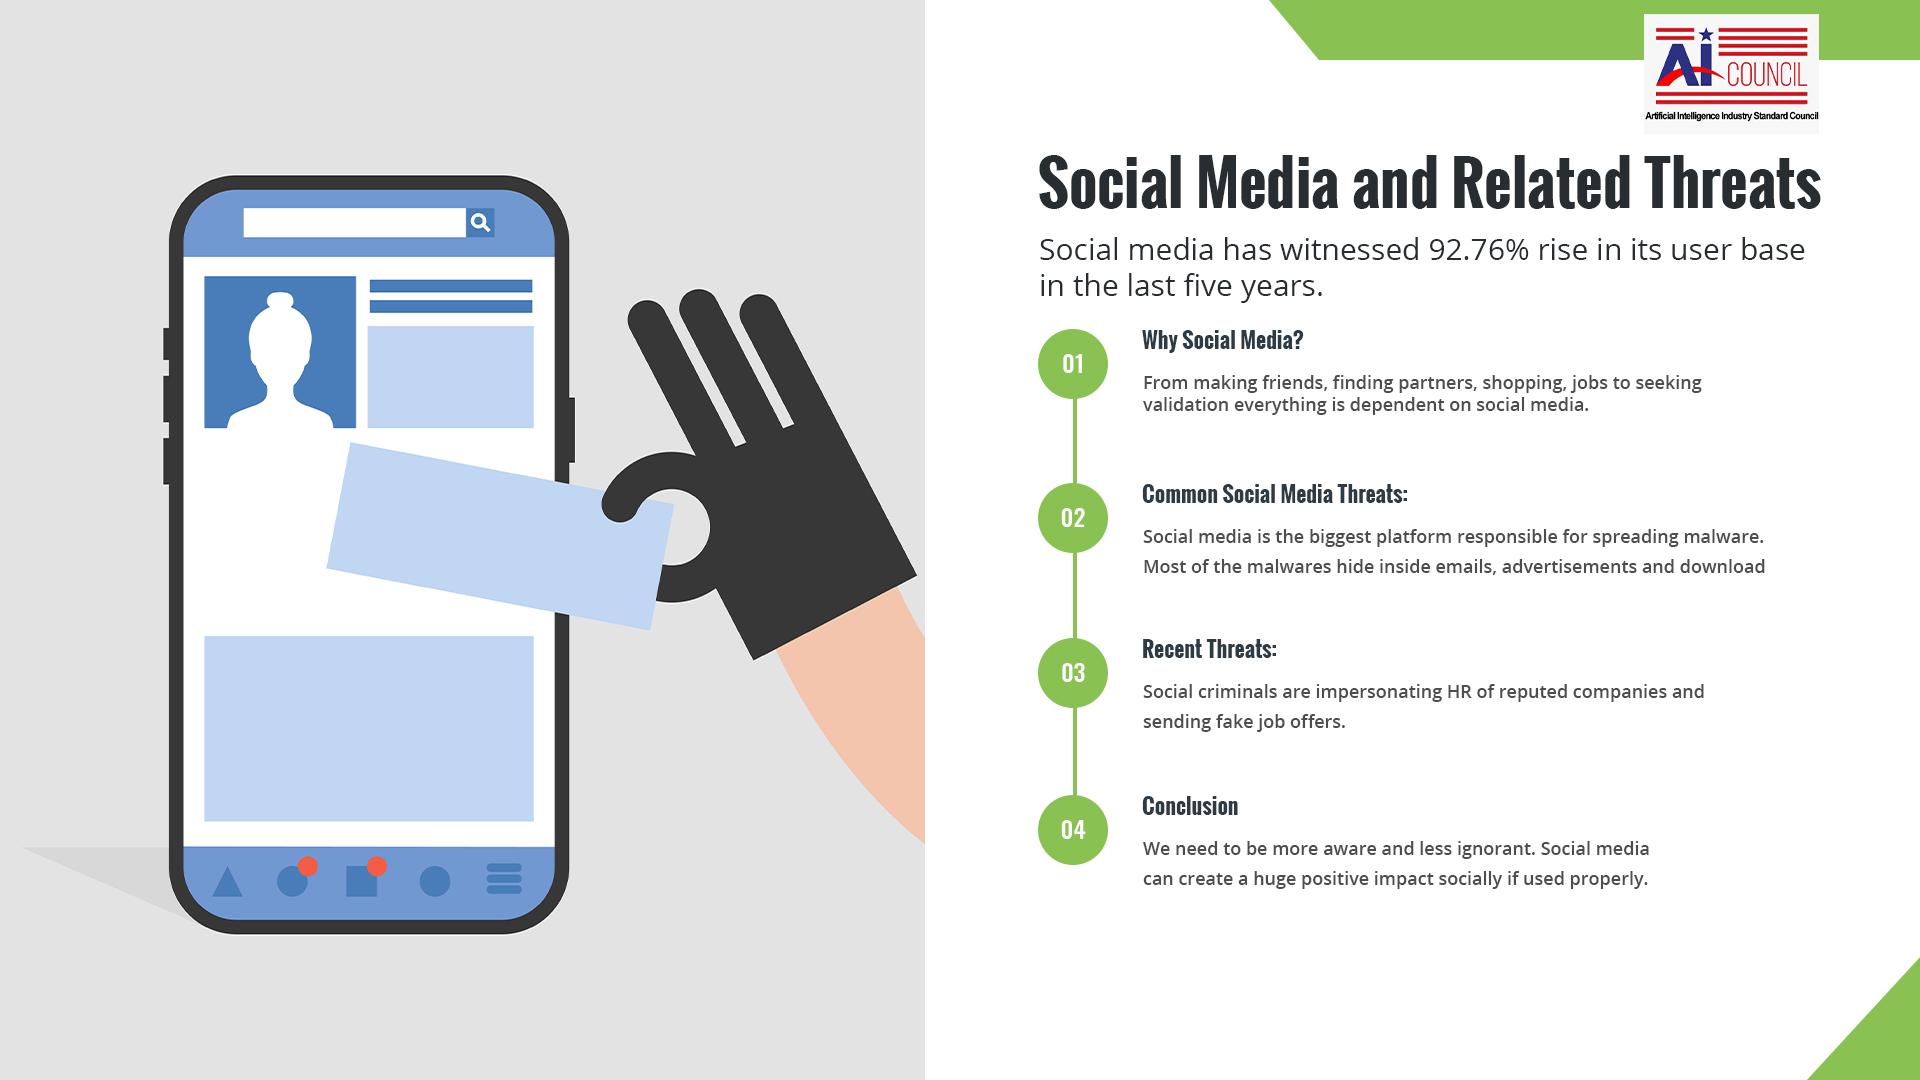 AI Council Blog- Social Media